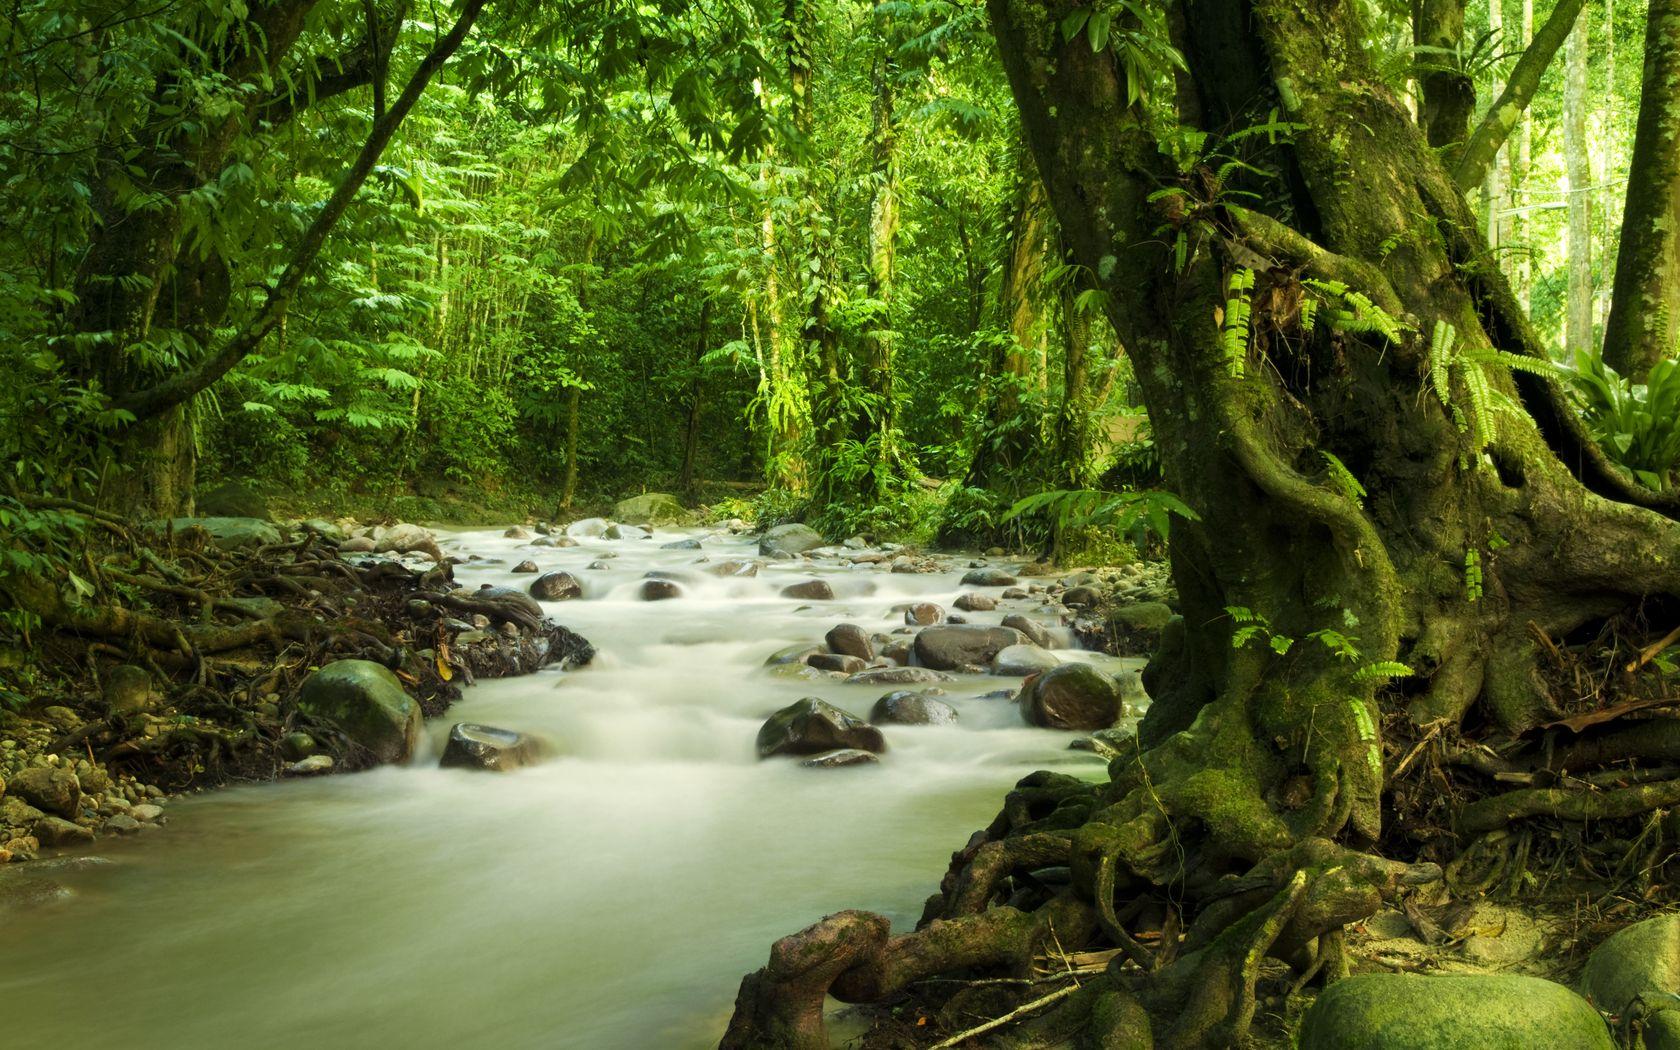 Fondo De Pantalla Selva: Fondos De Pantalla Hd Selvas